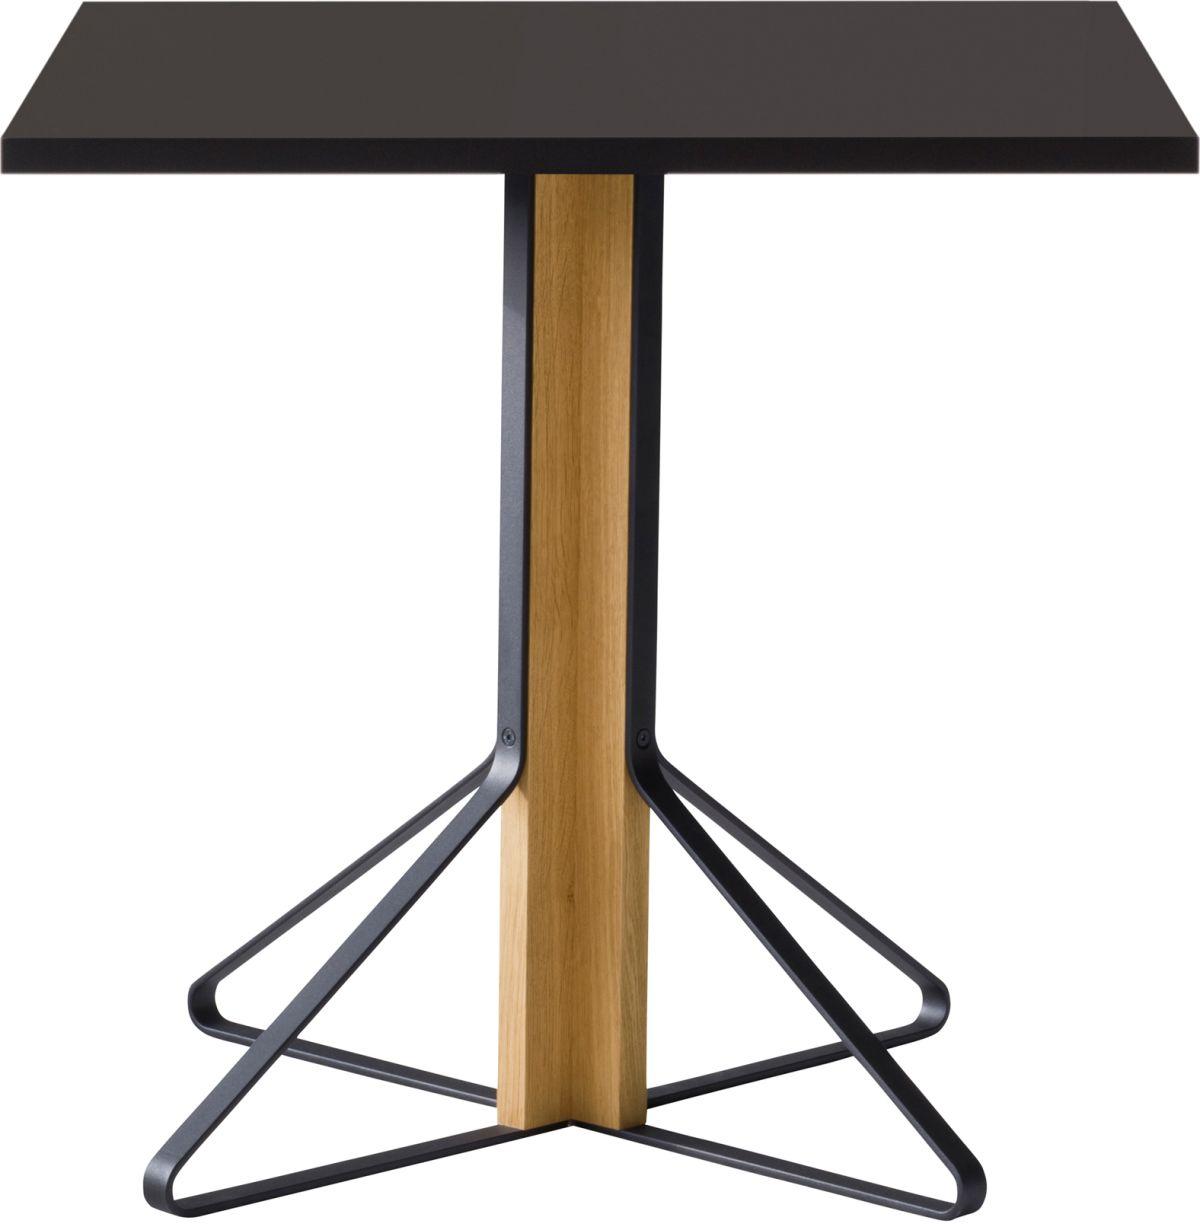 Kaari_Table_Square_Legs-Natural-Oak_Top-Black-Linoleum_Cut_Out_Srgb-2430513